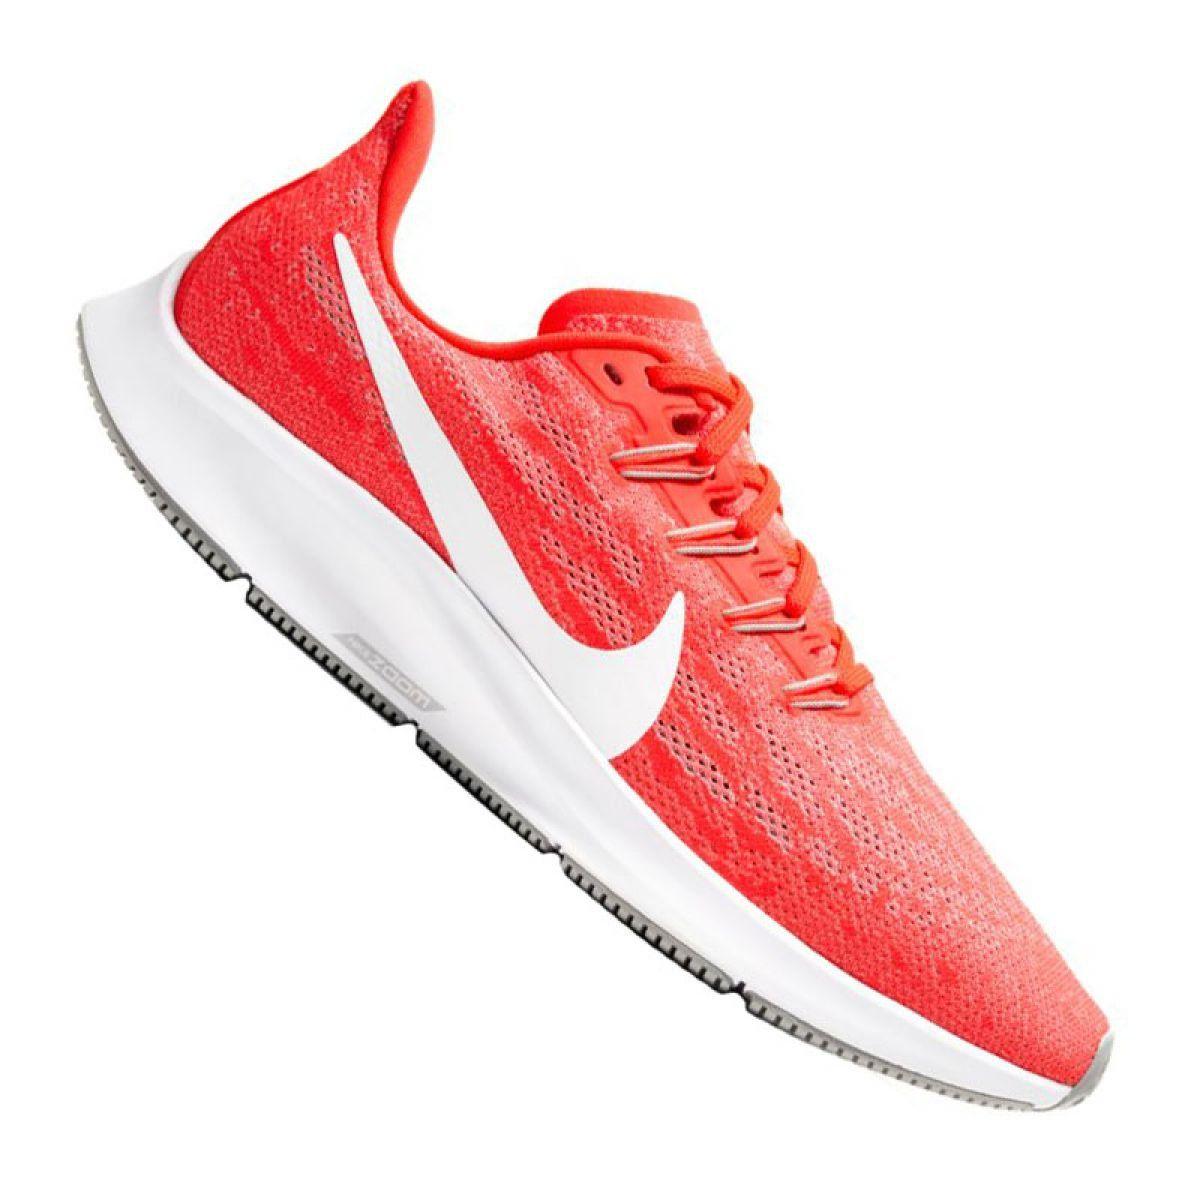 Buty Nike Air Zoom Pegasus 36 M Aq2203 602 Czerwone Nike Air Nike Air Zoom Pegasus Nike